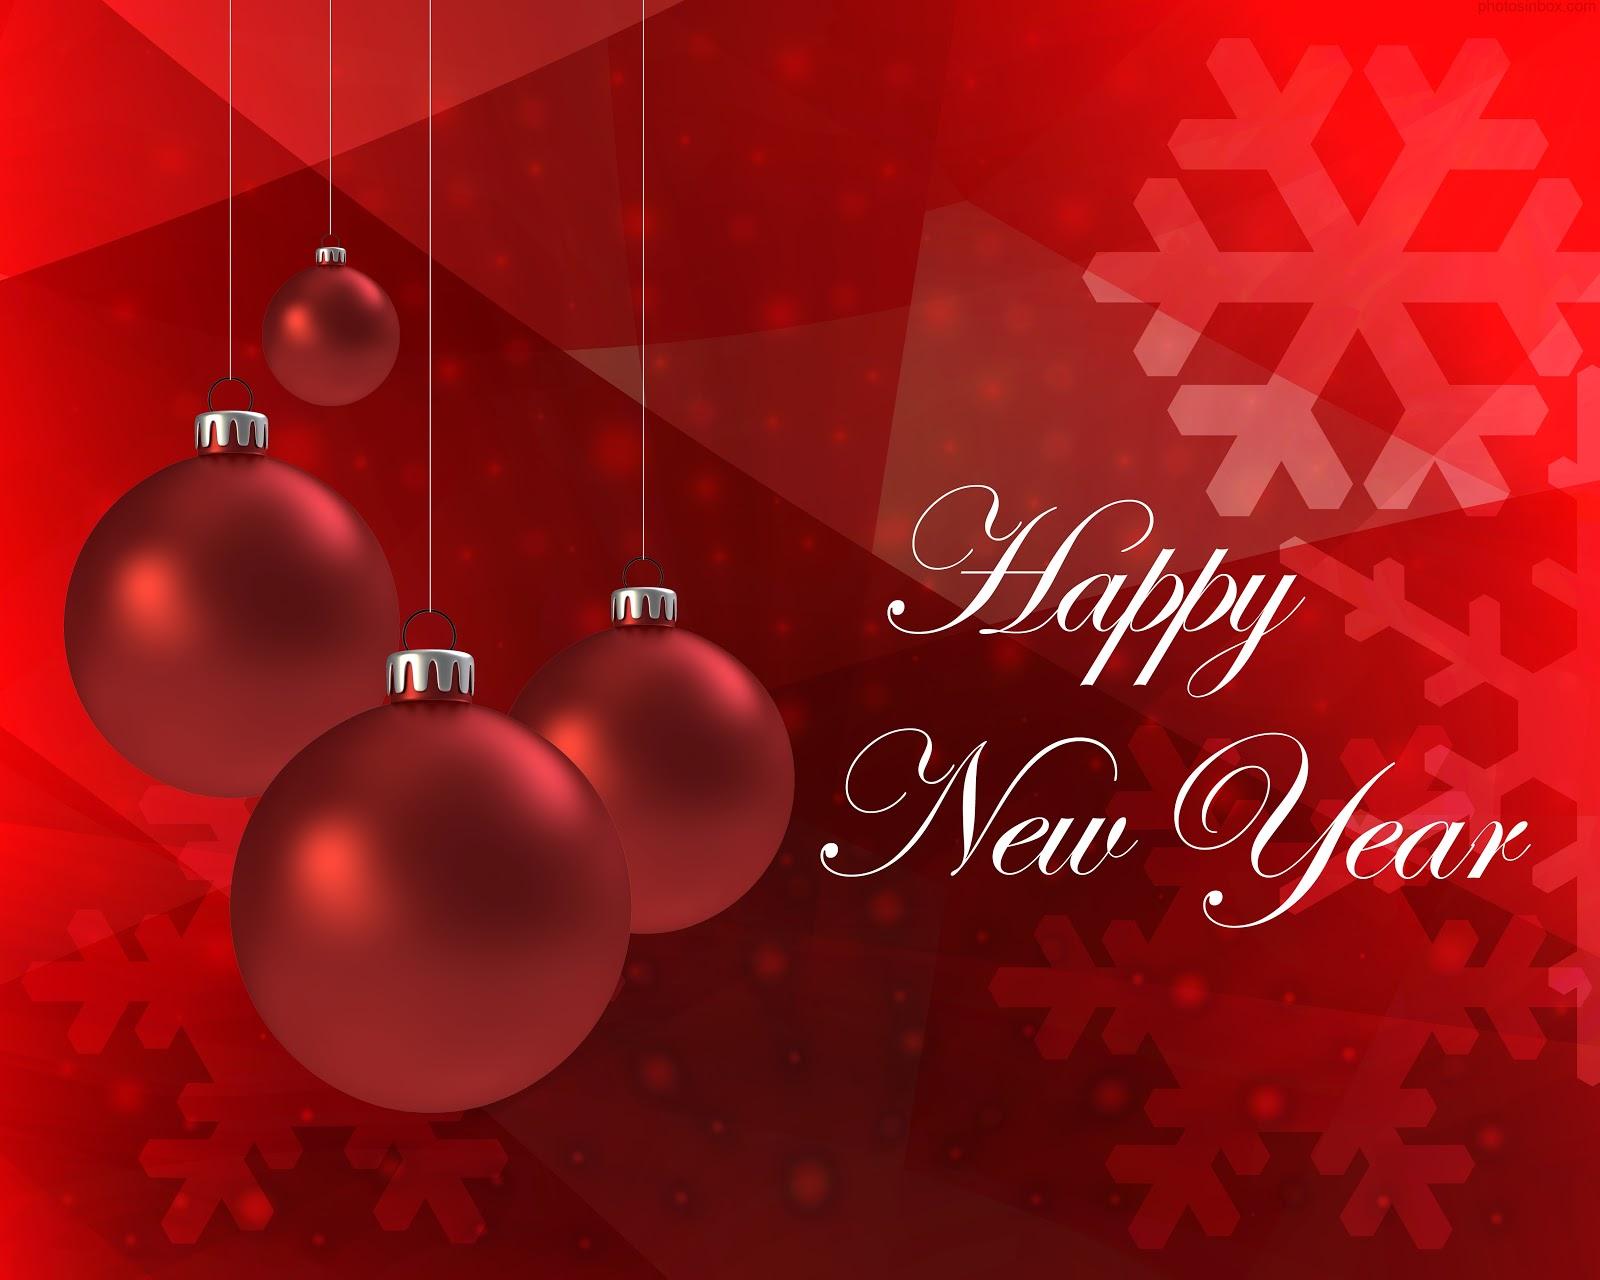 Sweetcouple Most Beautiful Happy New Year Wishes